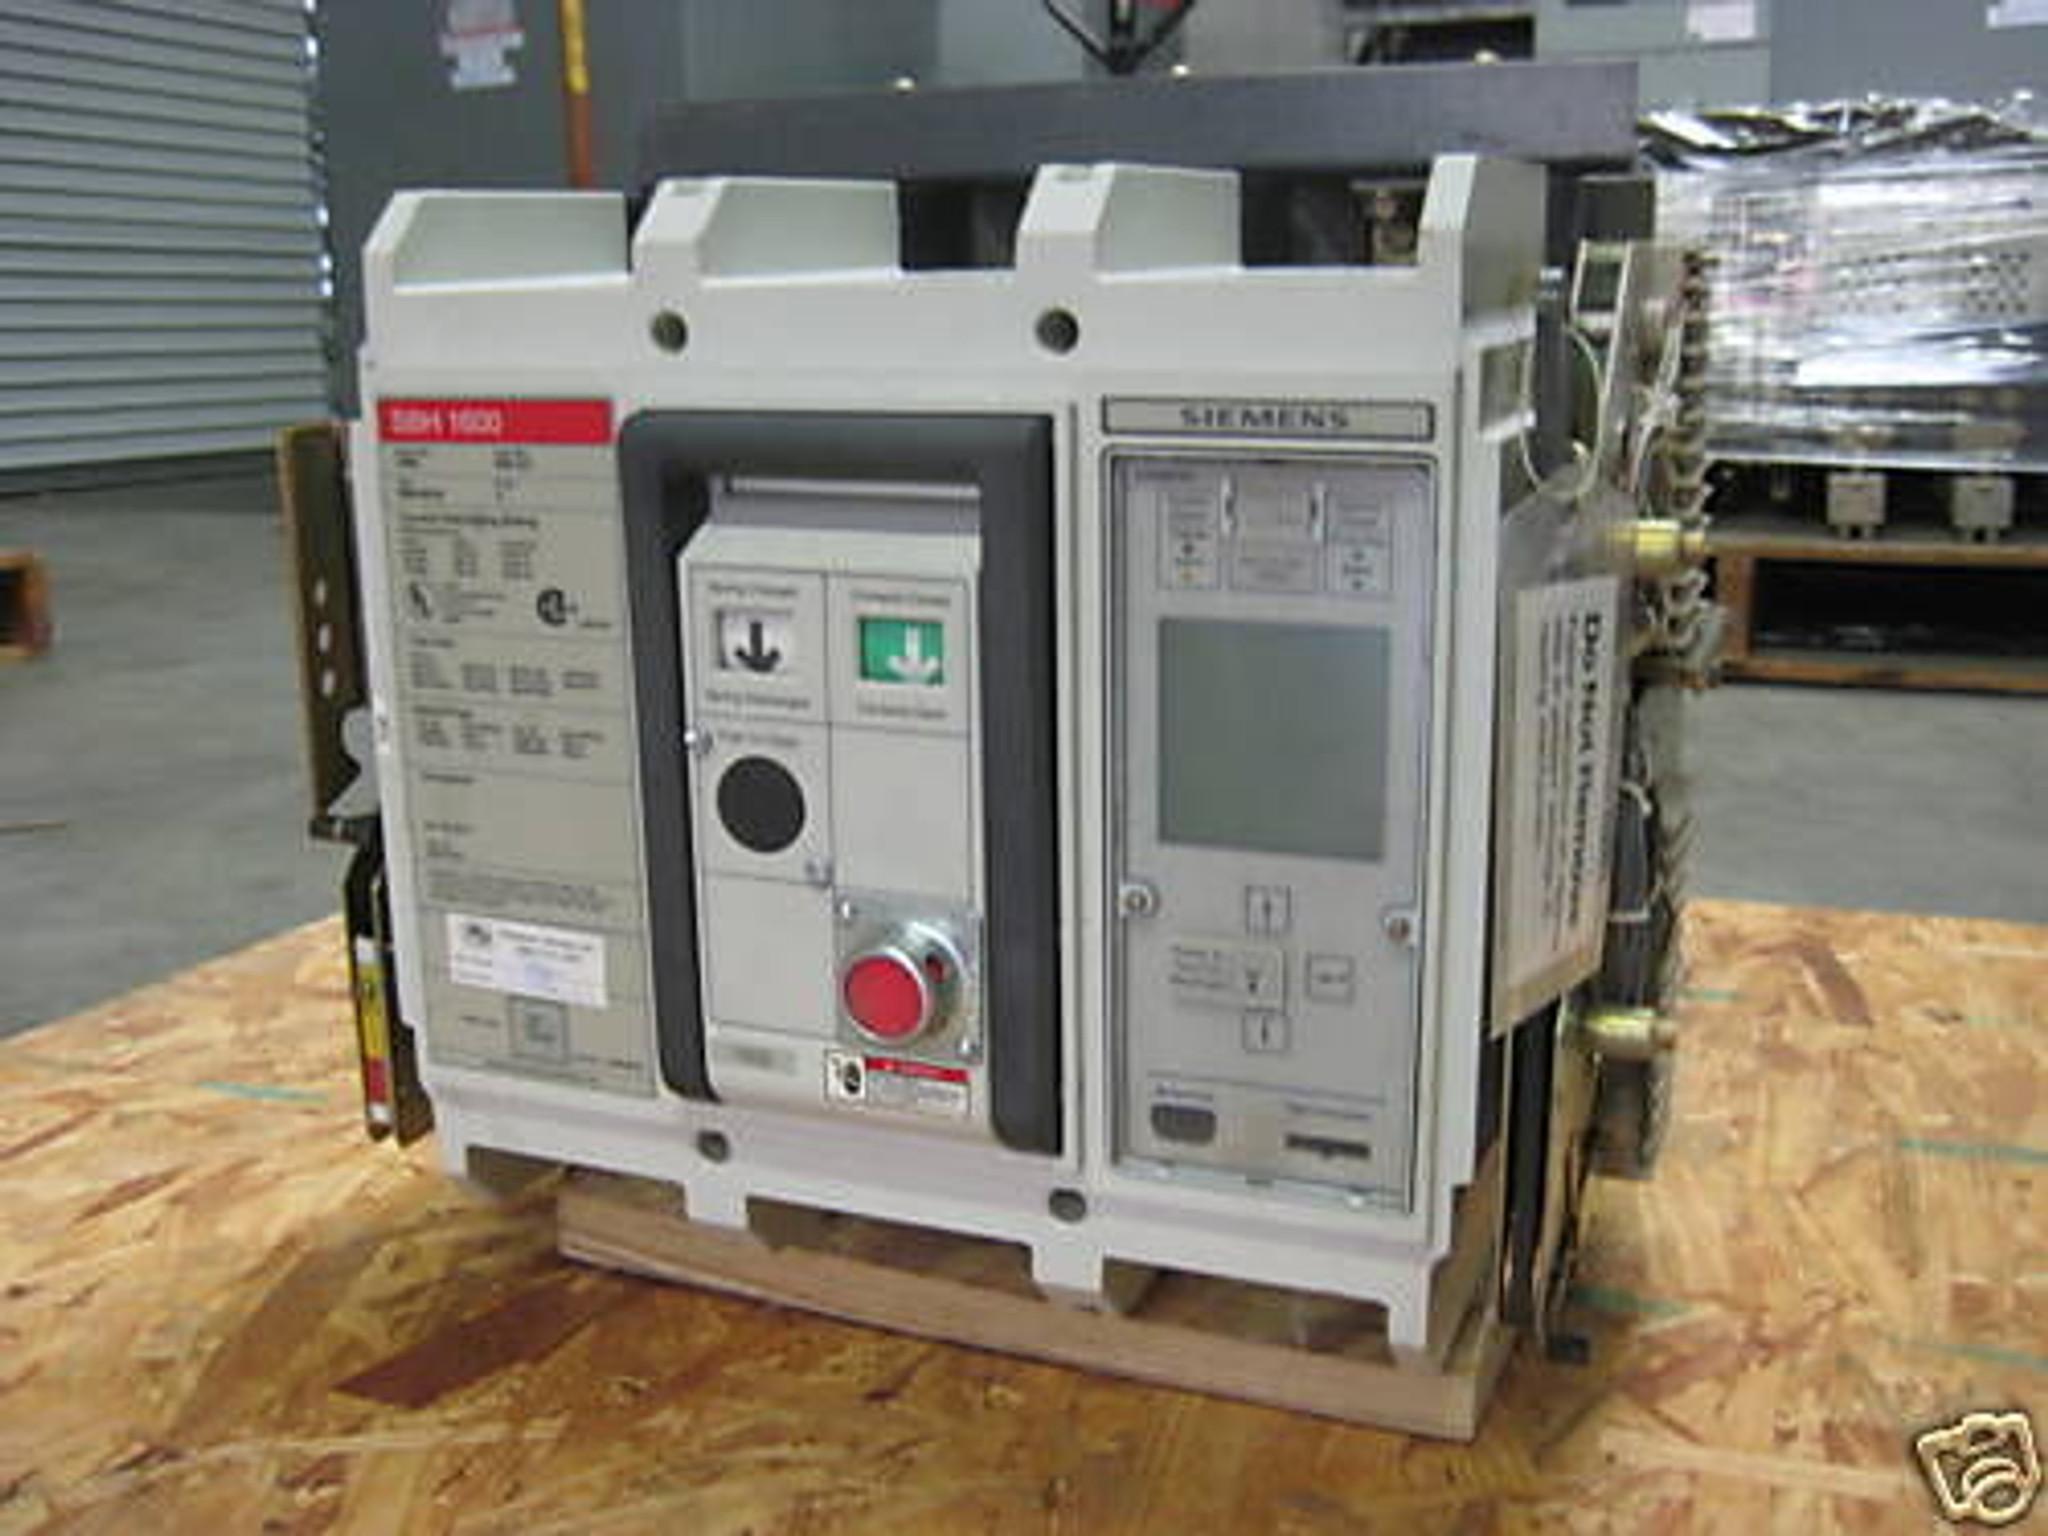 Siemens, ITE and Gould Breakers